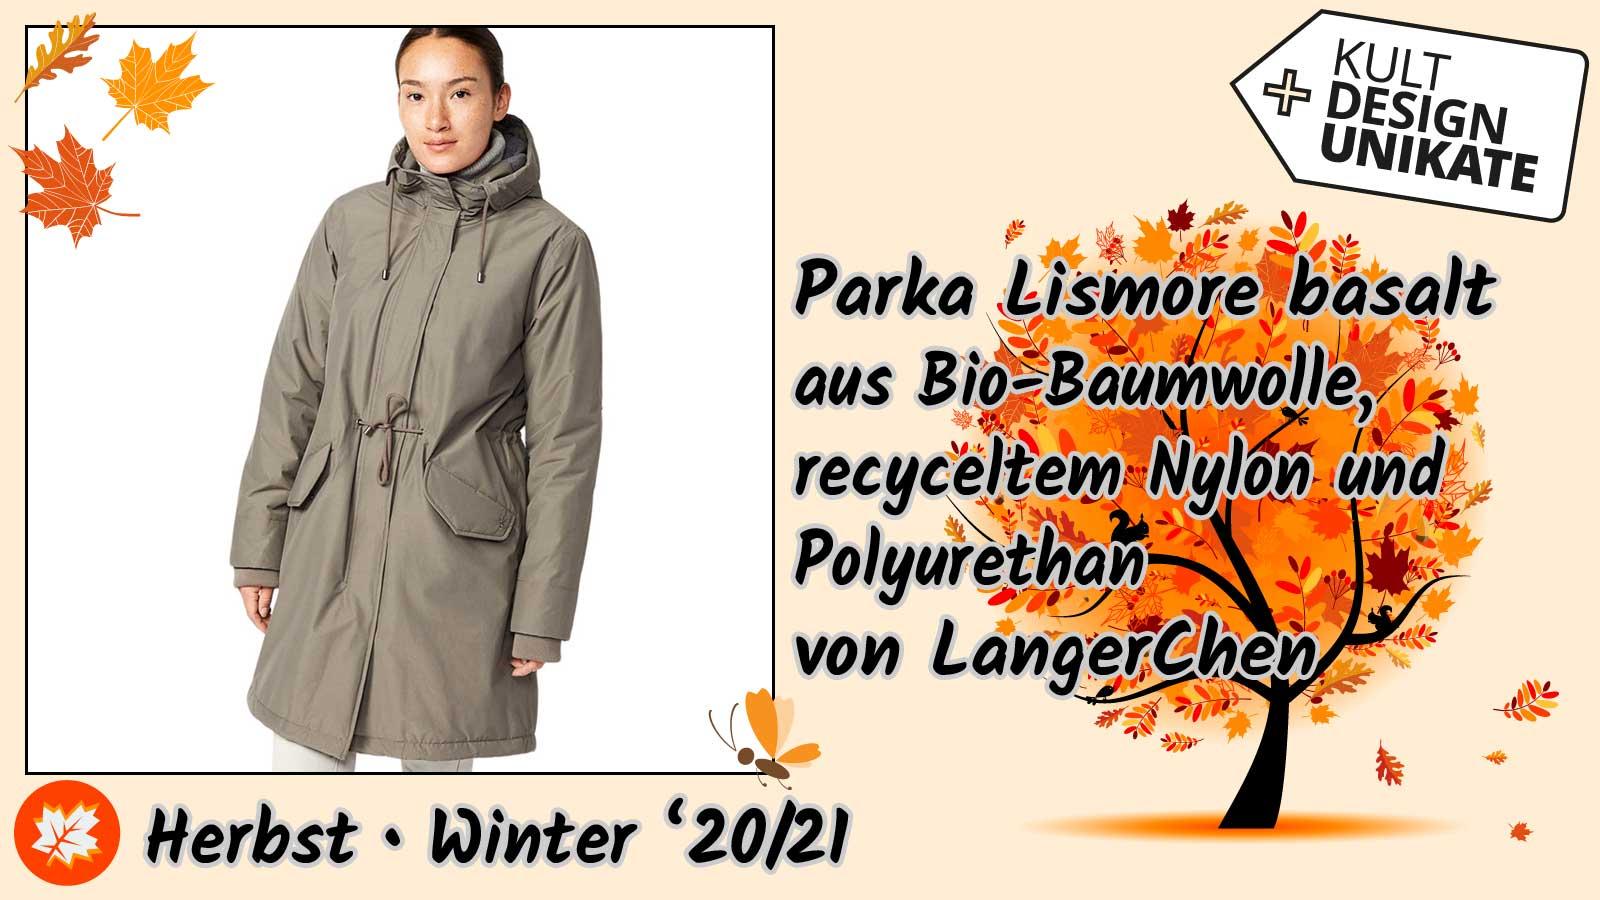 Langerchen-Parka-Lismore-basalt